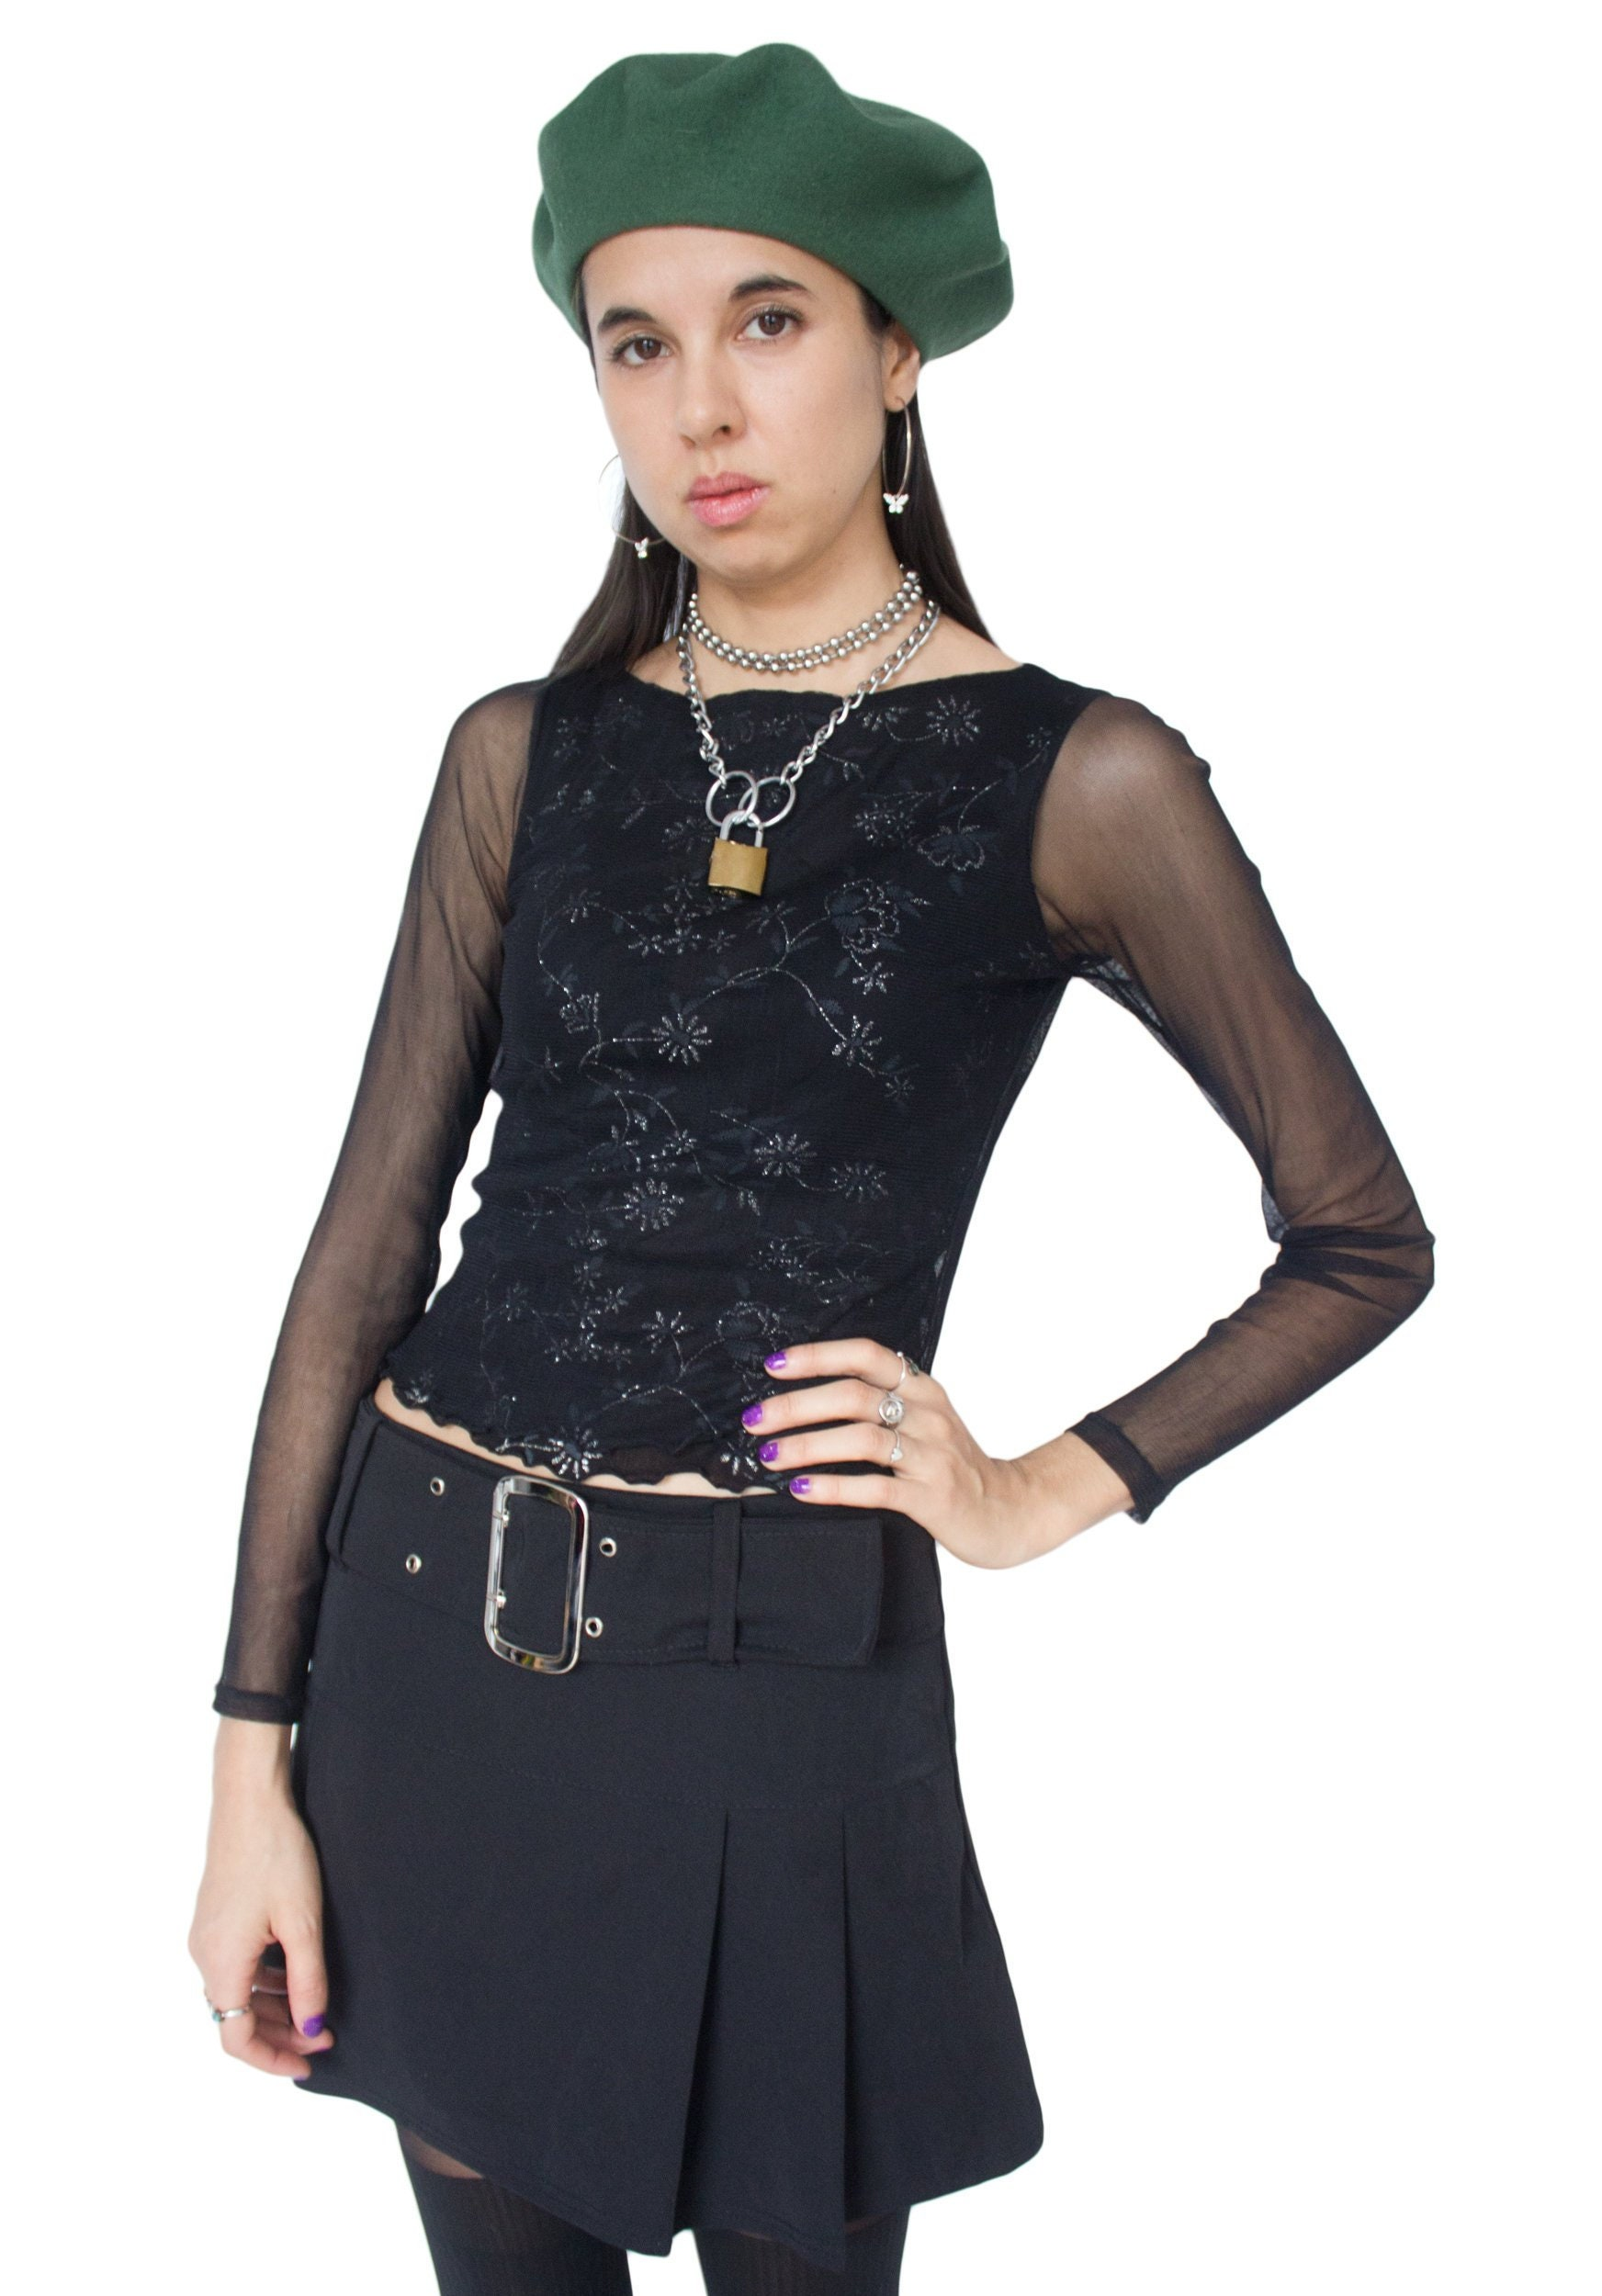 00fbe56d72d1e Vintage 90s Black Mesh Floral Long Sleeve Top S